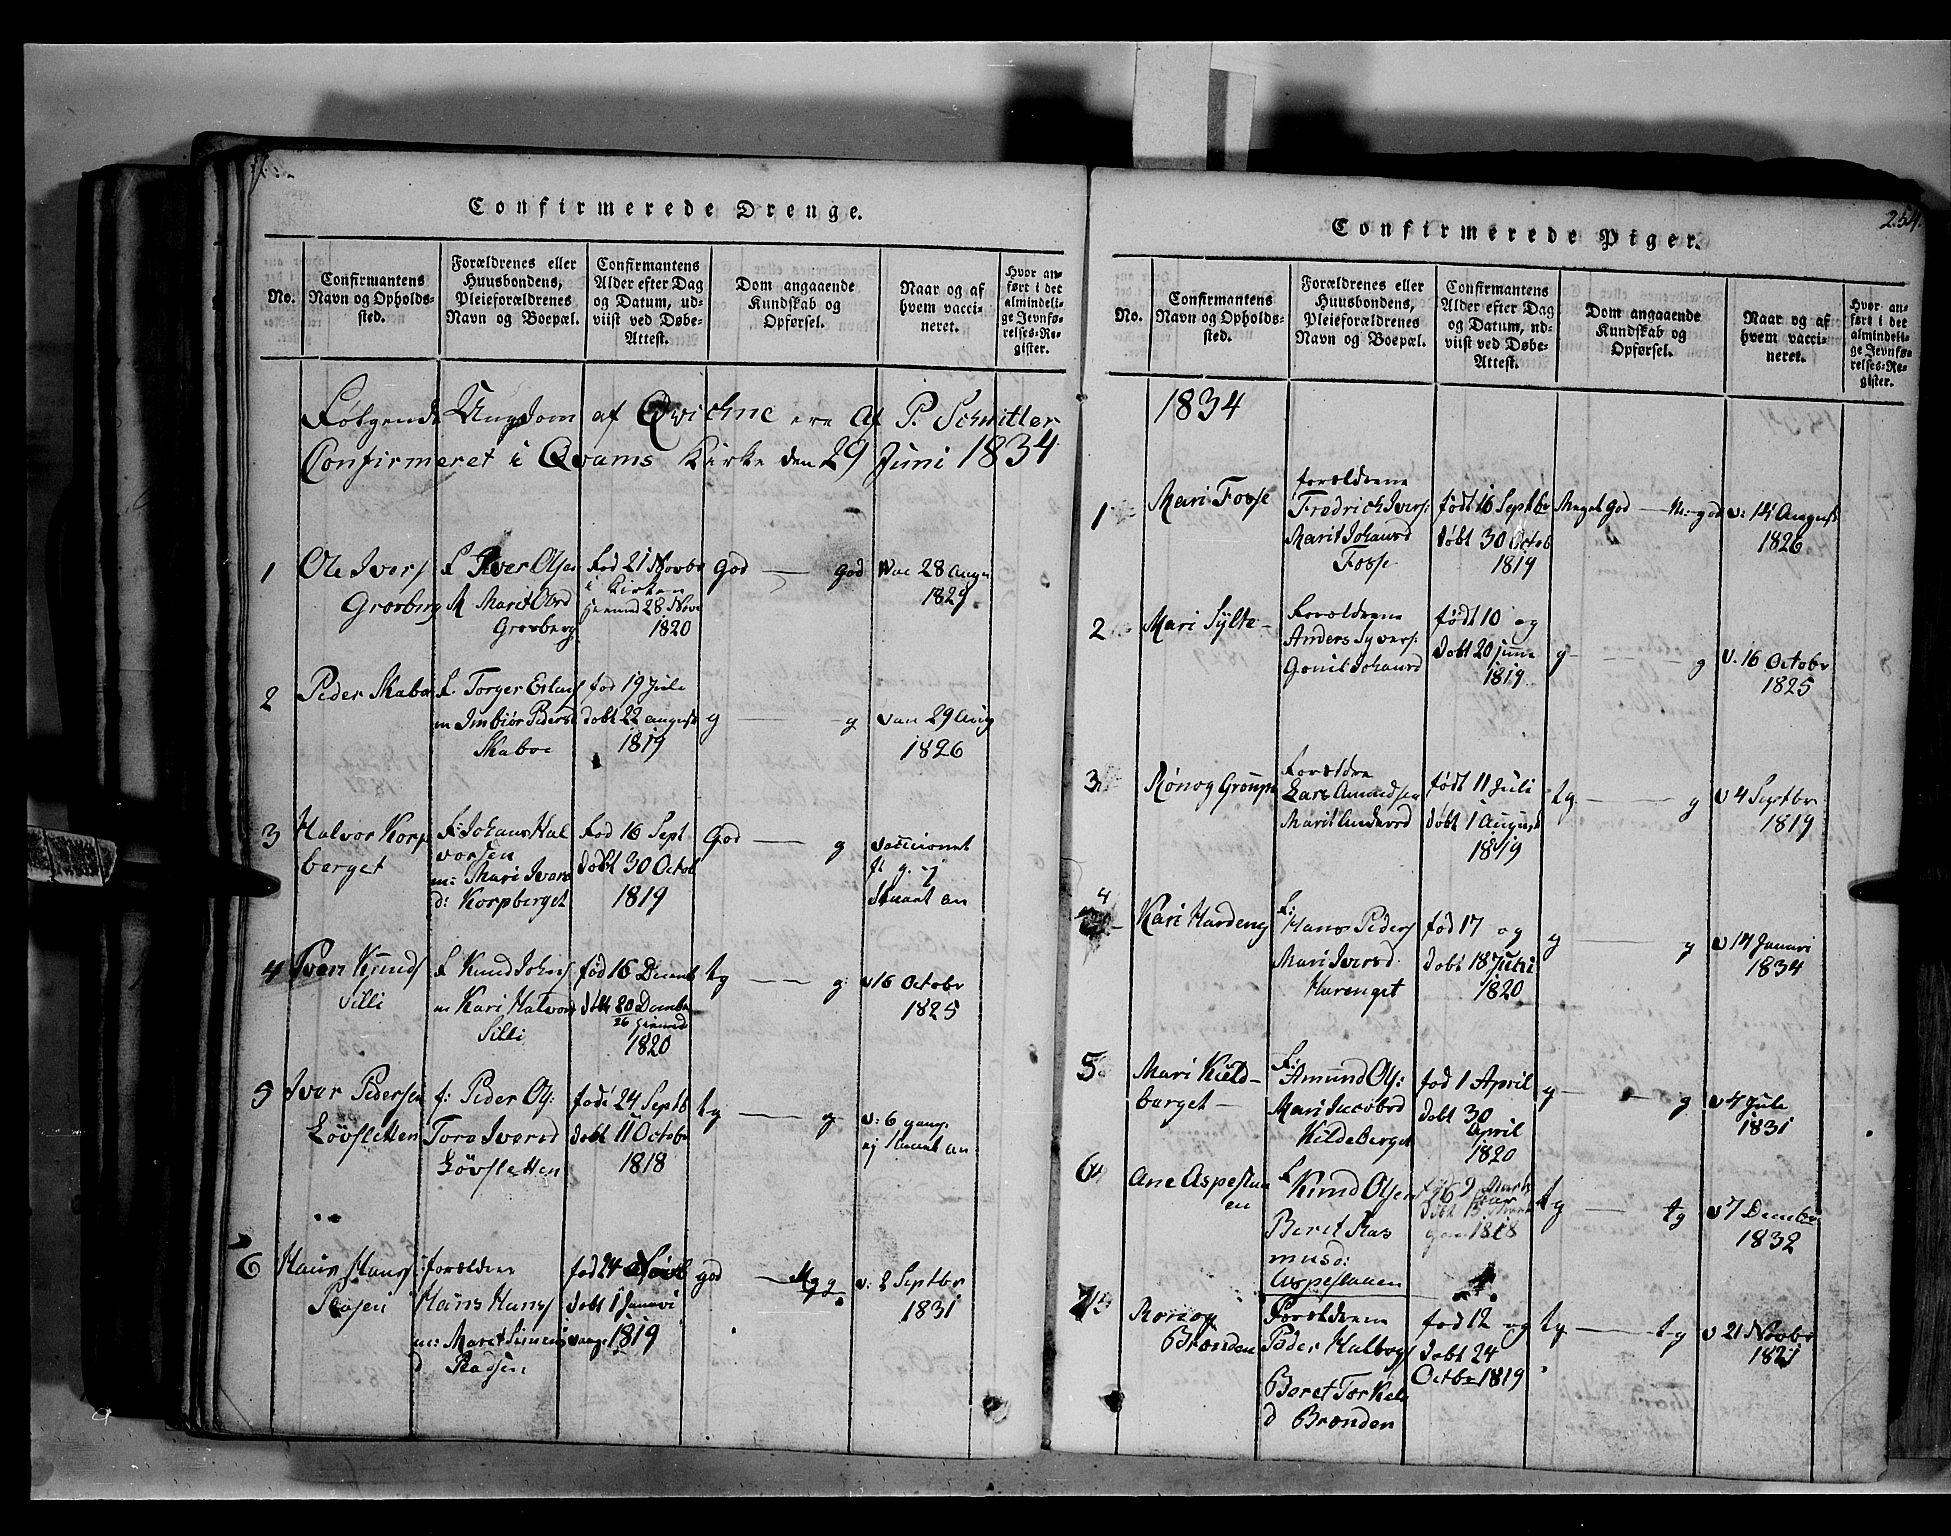 SAH, Fron prestekontor, H/Ha/Hab/L0003: Klokkerbok nr. 3, 1816-1850, s. 254